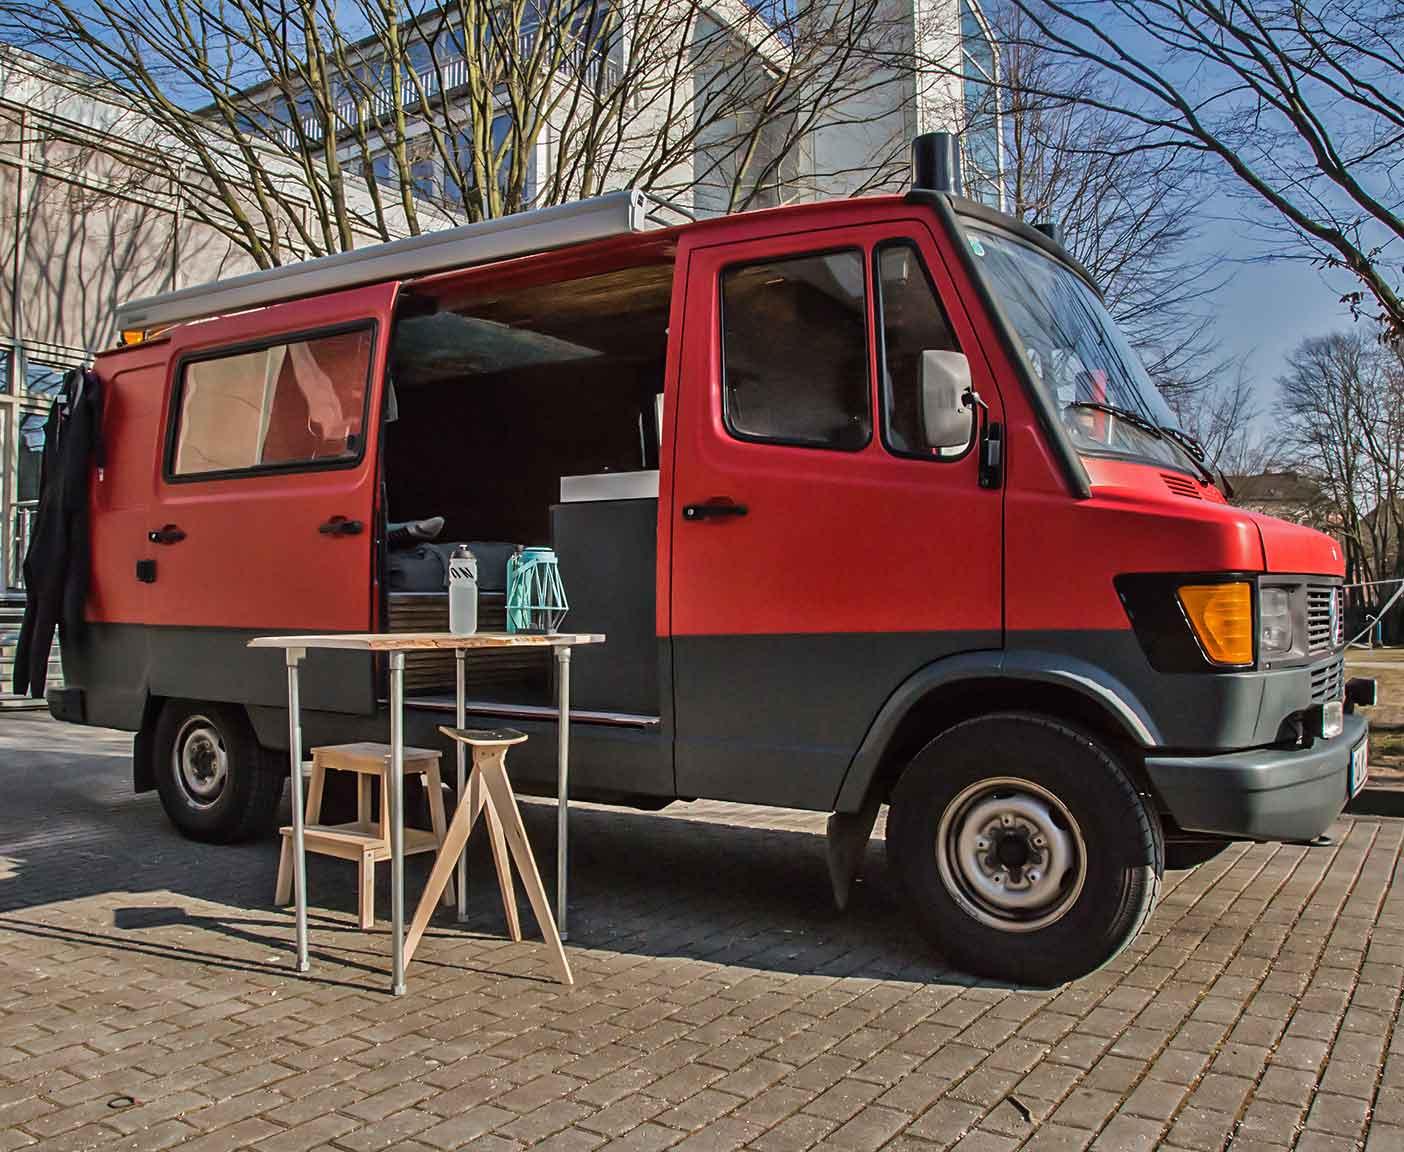 mercedes-310-benzin-4x4-zu-verkaufen-wohnmobil-technische-daten-allrad-d-5